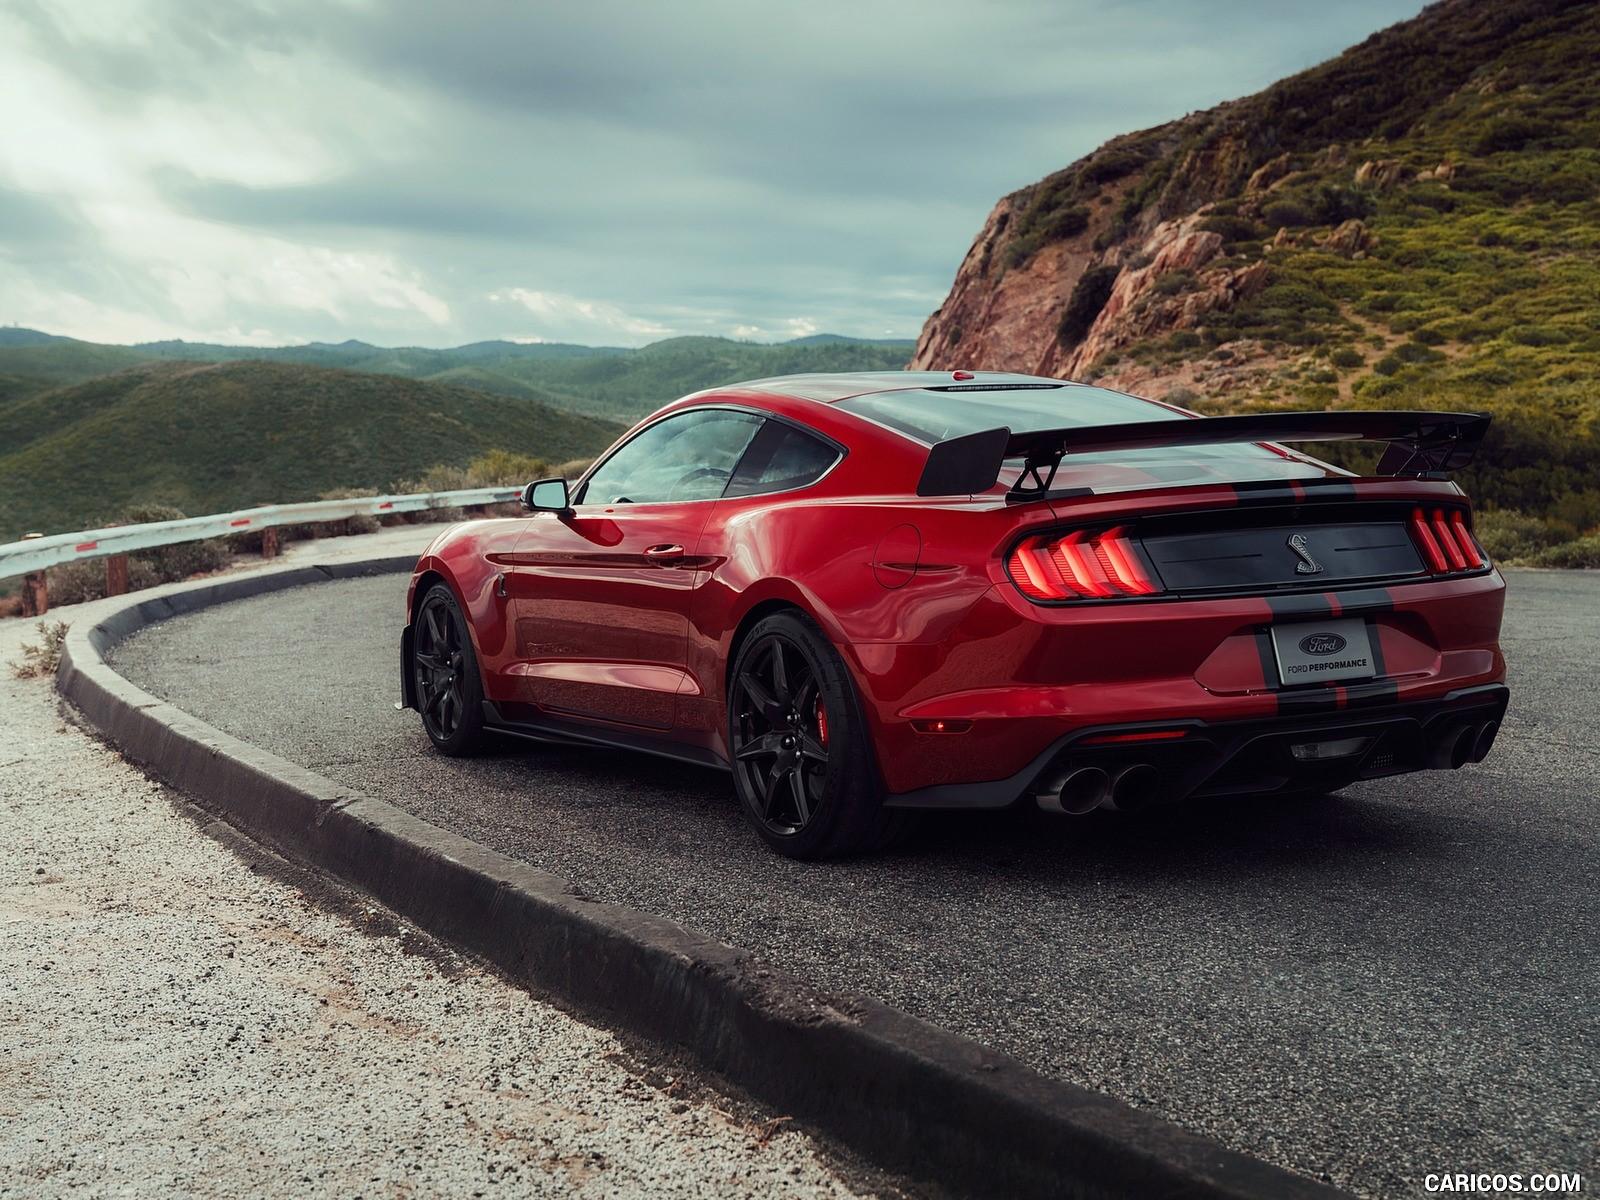 Ford Mustang Shelby 2k wallpaper